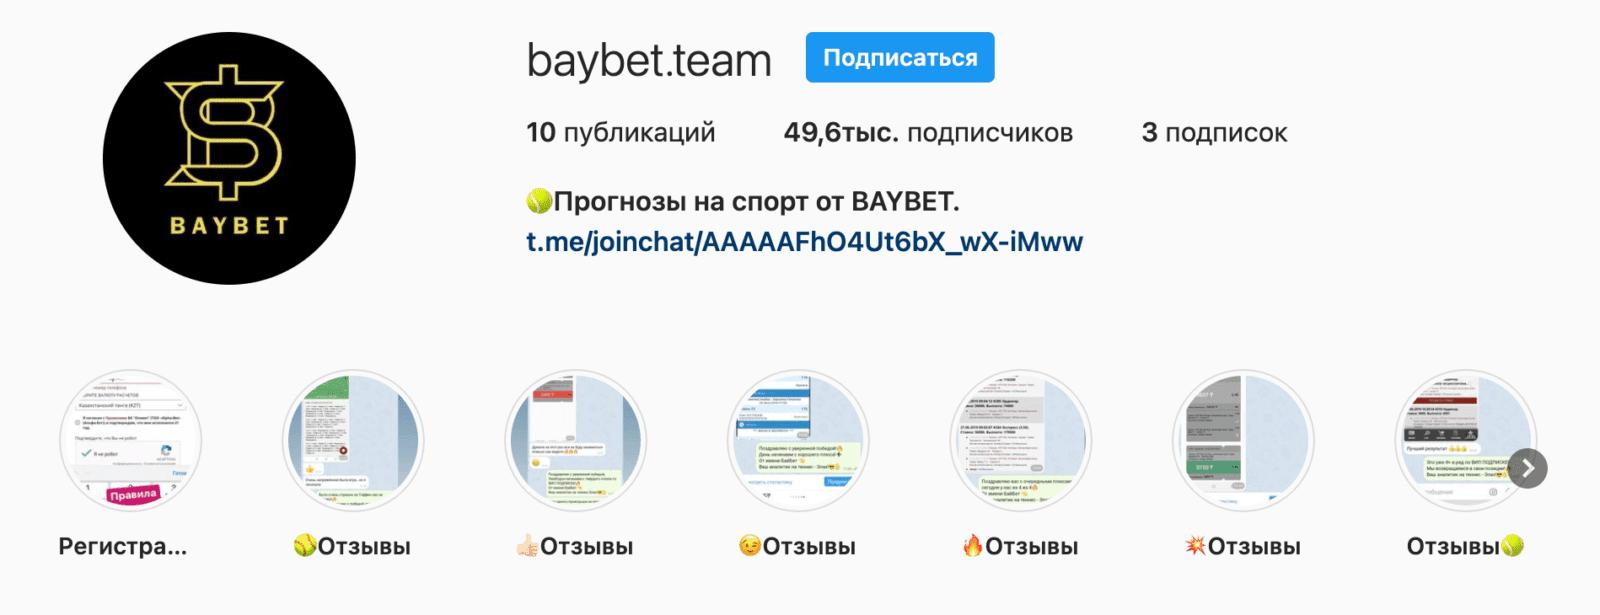 Инстаграм канал BayBet (Байбет)